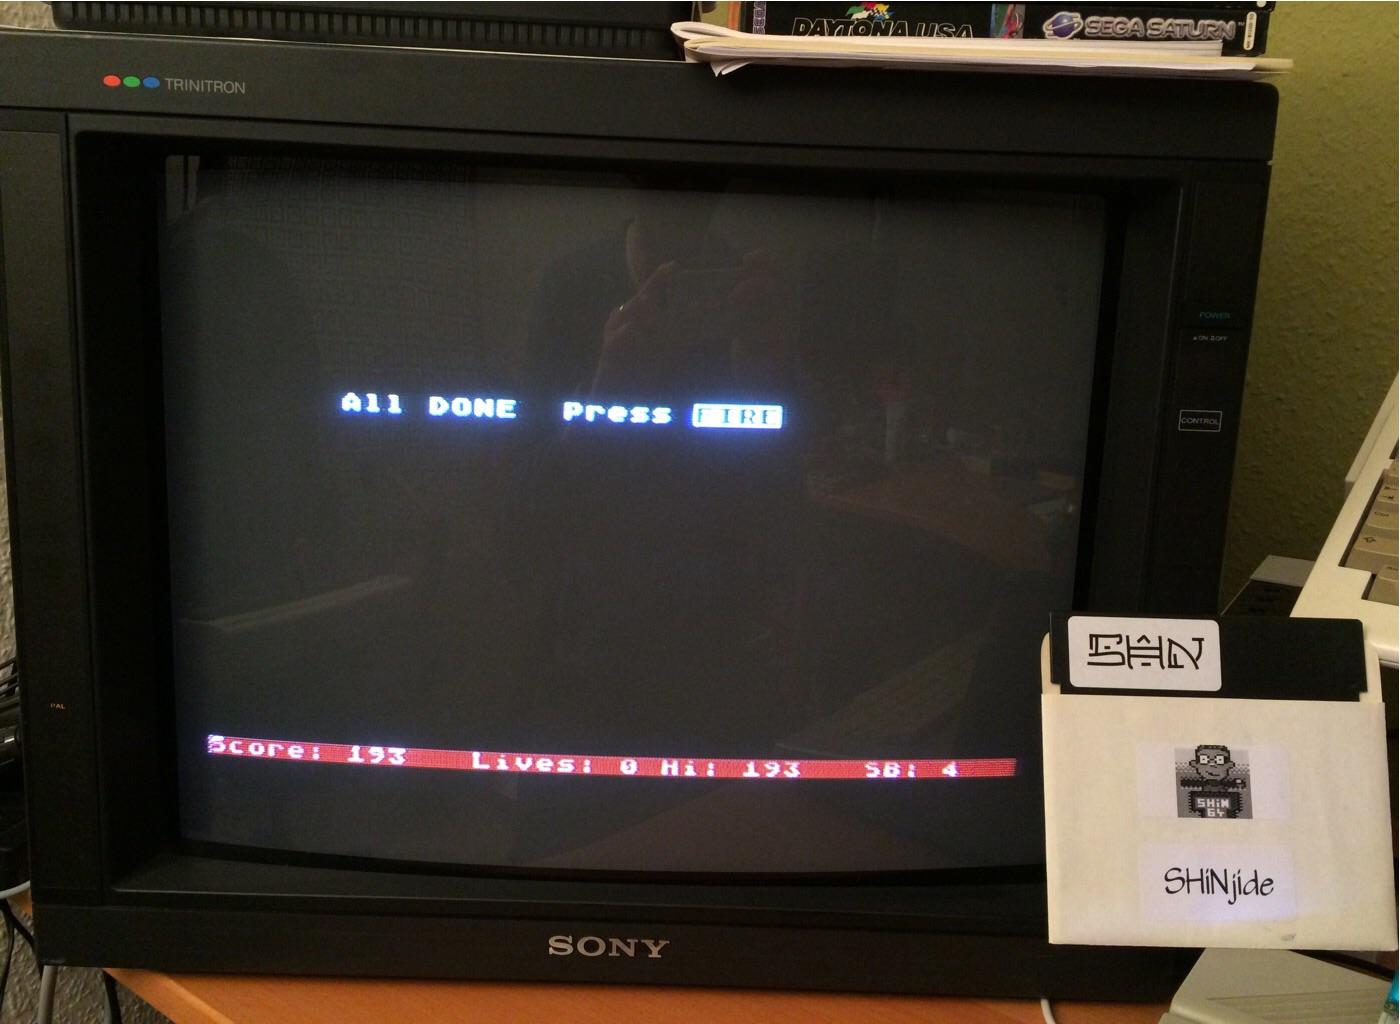 SHiNjide: Analog Man (Atari 400/800/XL/XE) 193 points on 2015-01-09 13:10:47